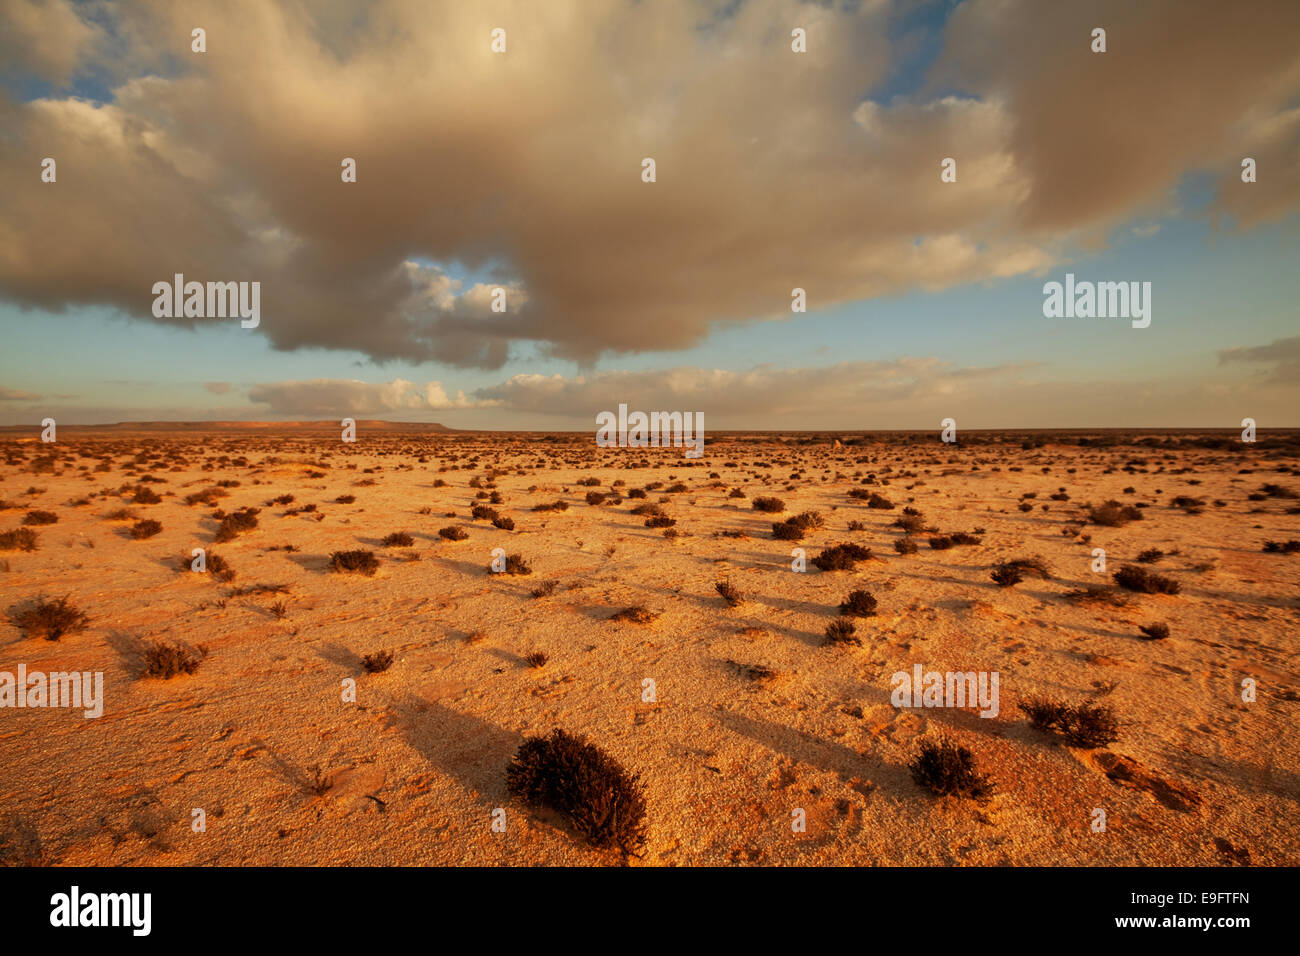 Desert in Western Sahara - Stock Image